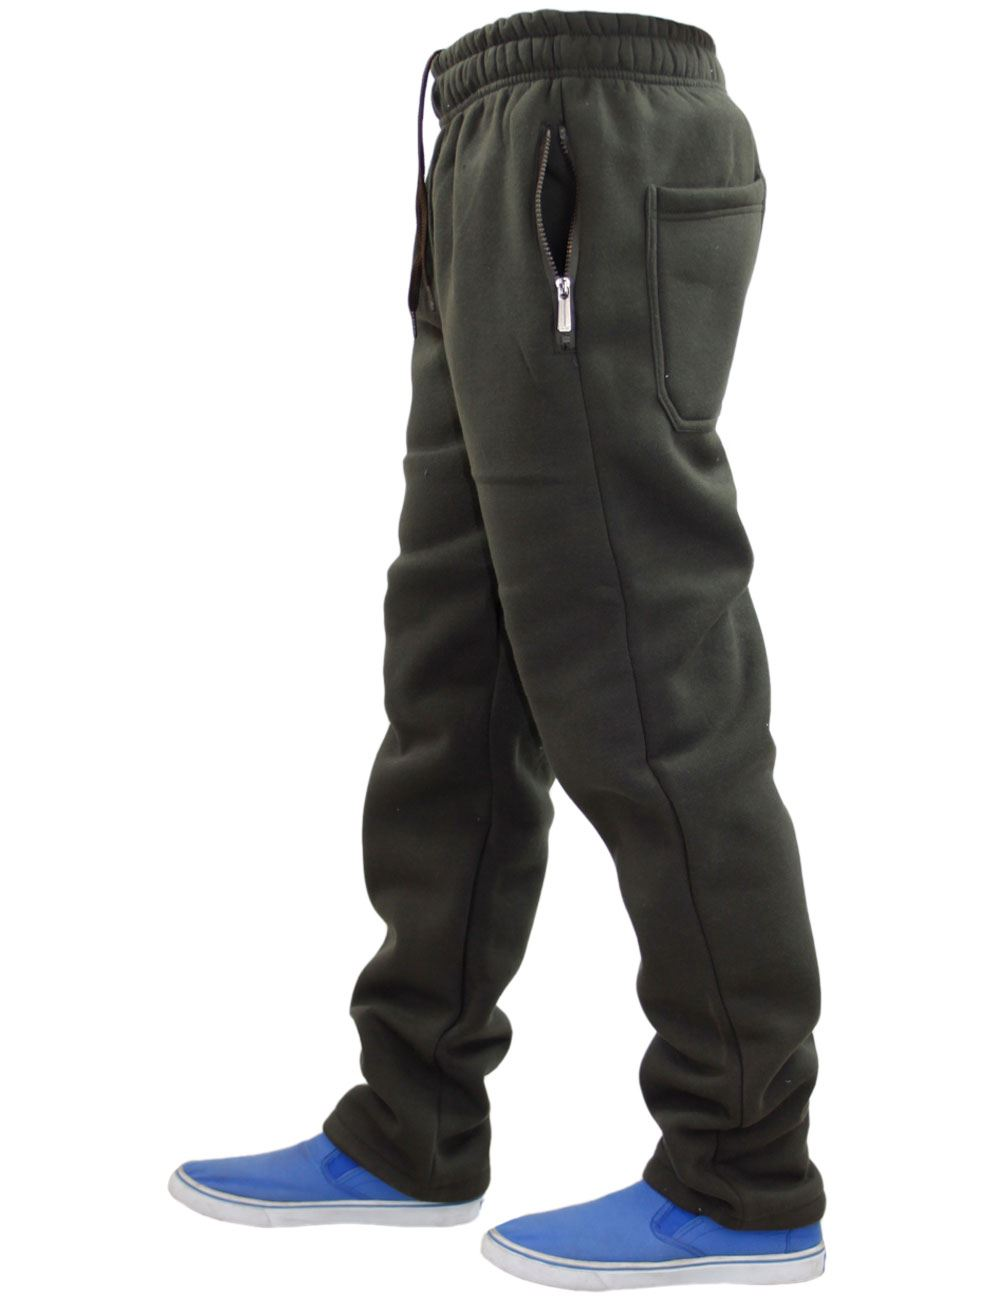 Mens-Women-Plain-Fleece-Joggers-Bottoms-Jogging-Pant-Gym-Fitness-Sports-Trousers thumbnail 8